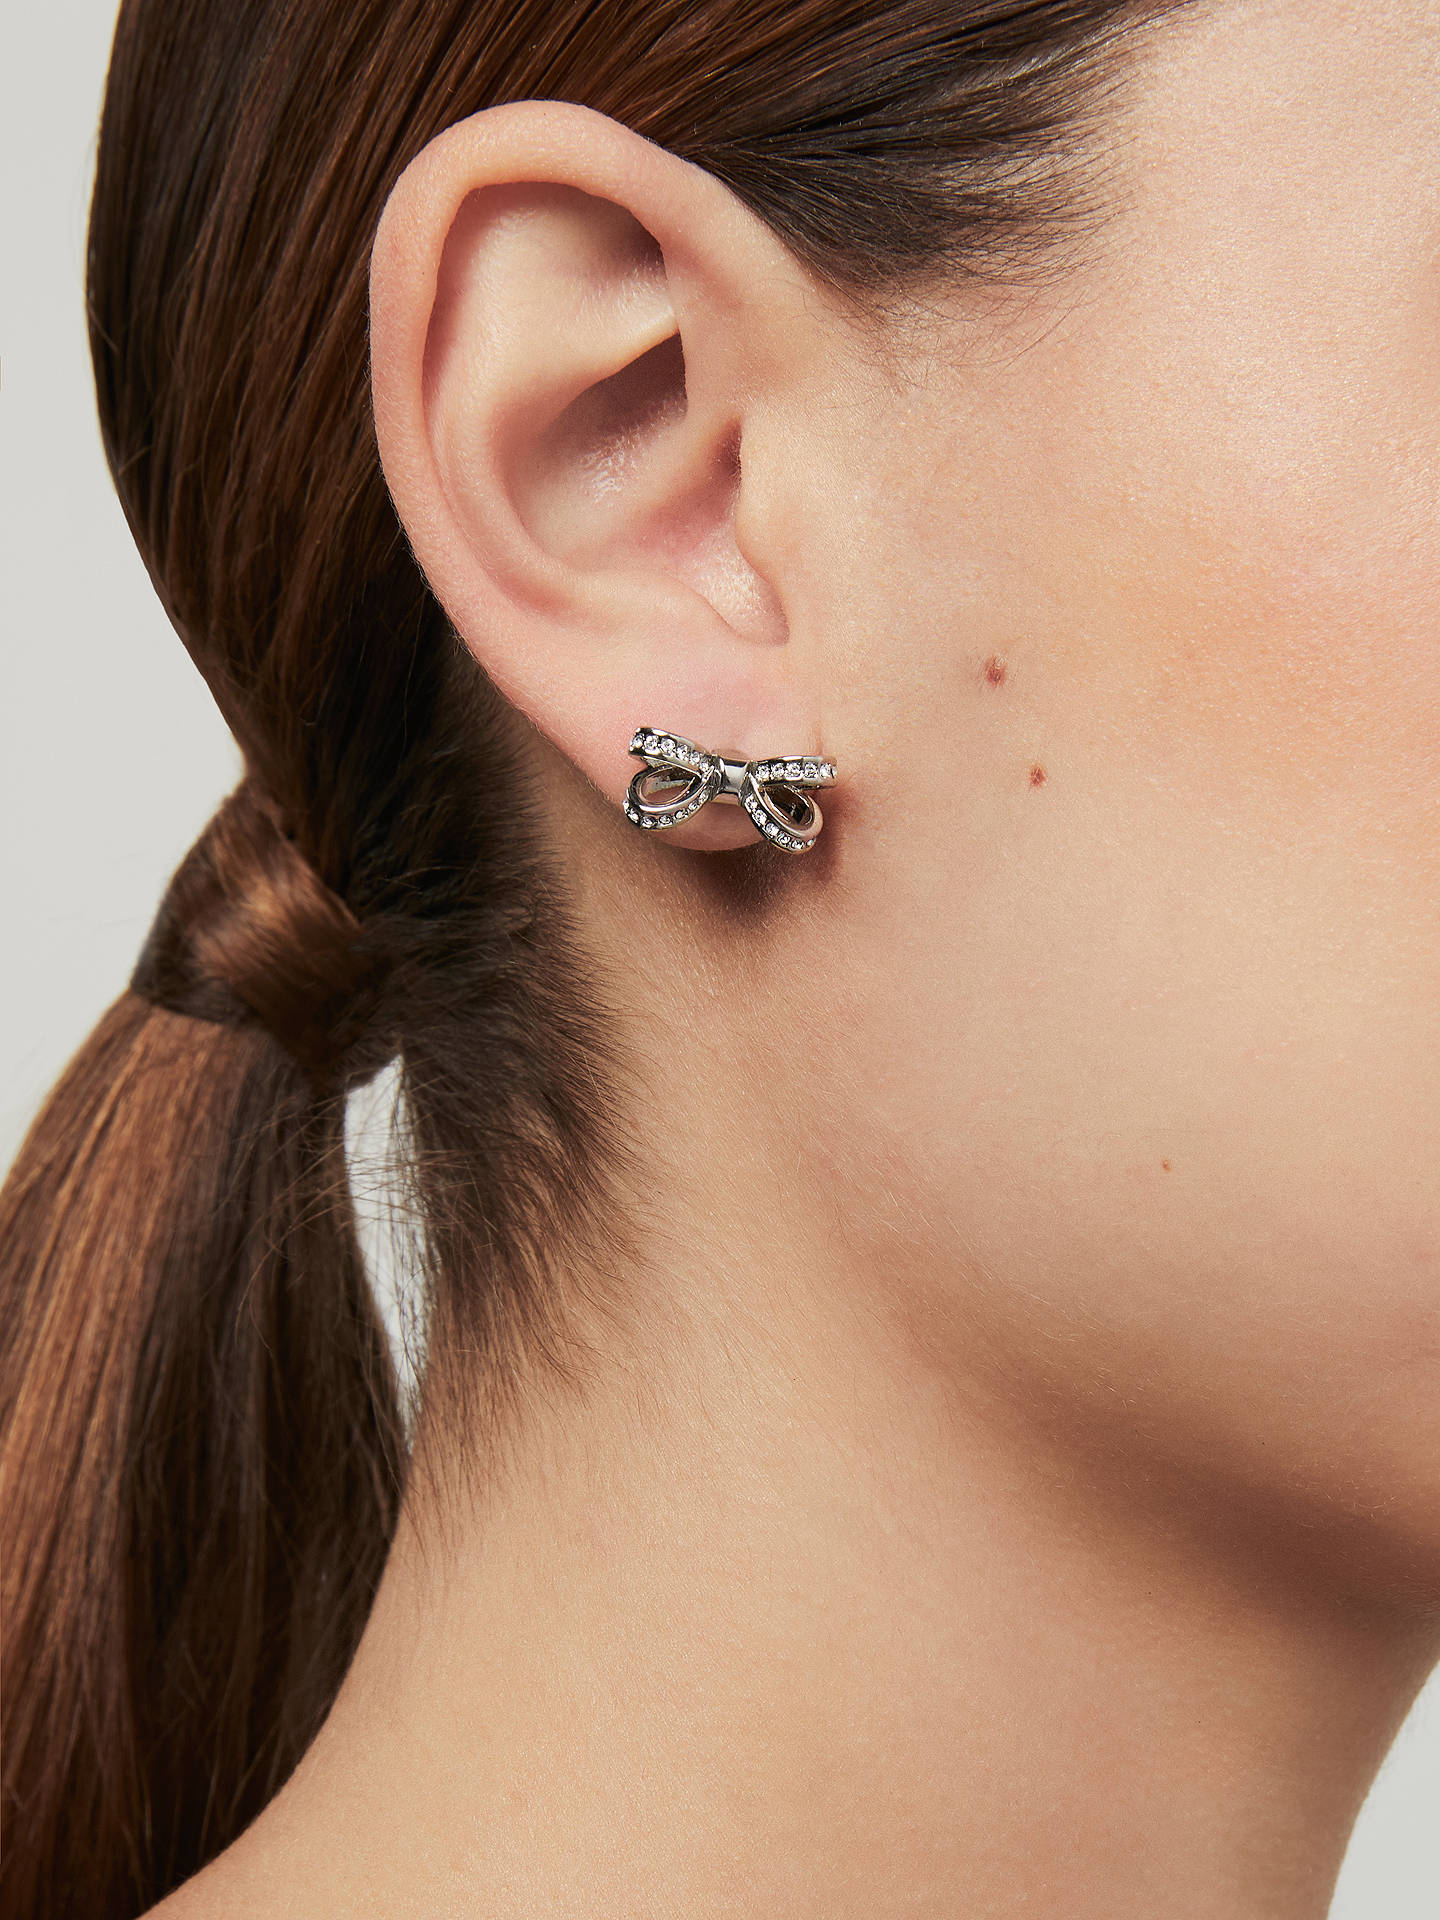 51e2a35e2 ... Buy Ted Baker Olitta Mini Pave Swarovski Crystal Bow Stud Earrings,  Silver Online at johnlewis ...